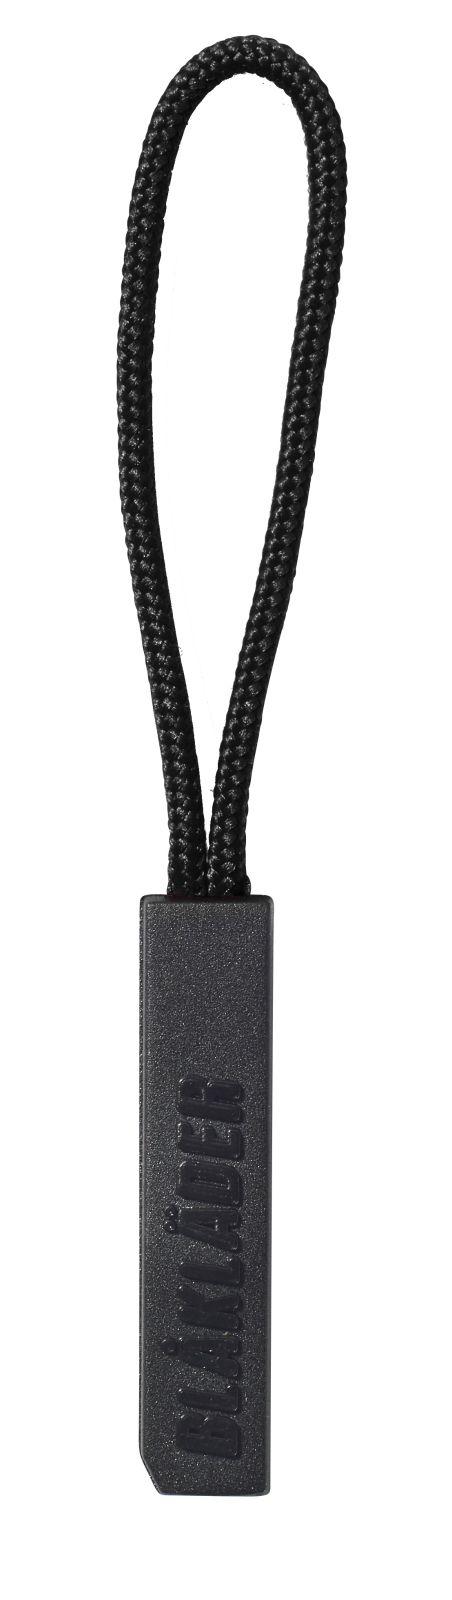 Blaklader Rits puller 21550000 zwart(9900)